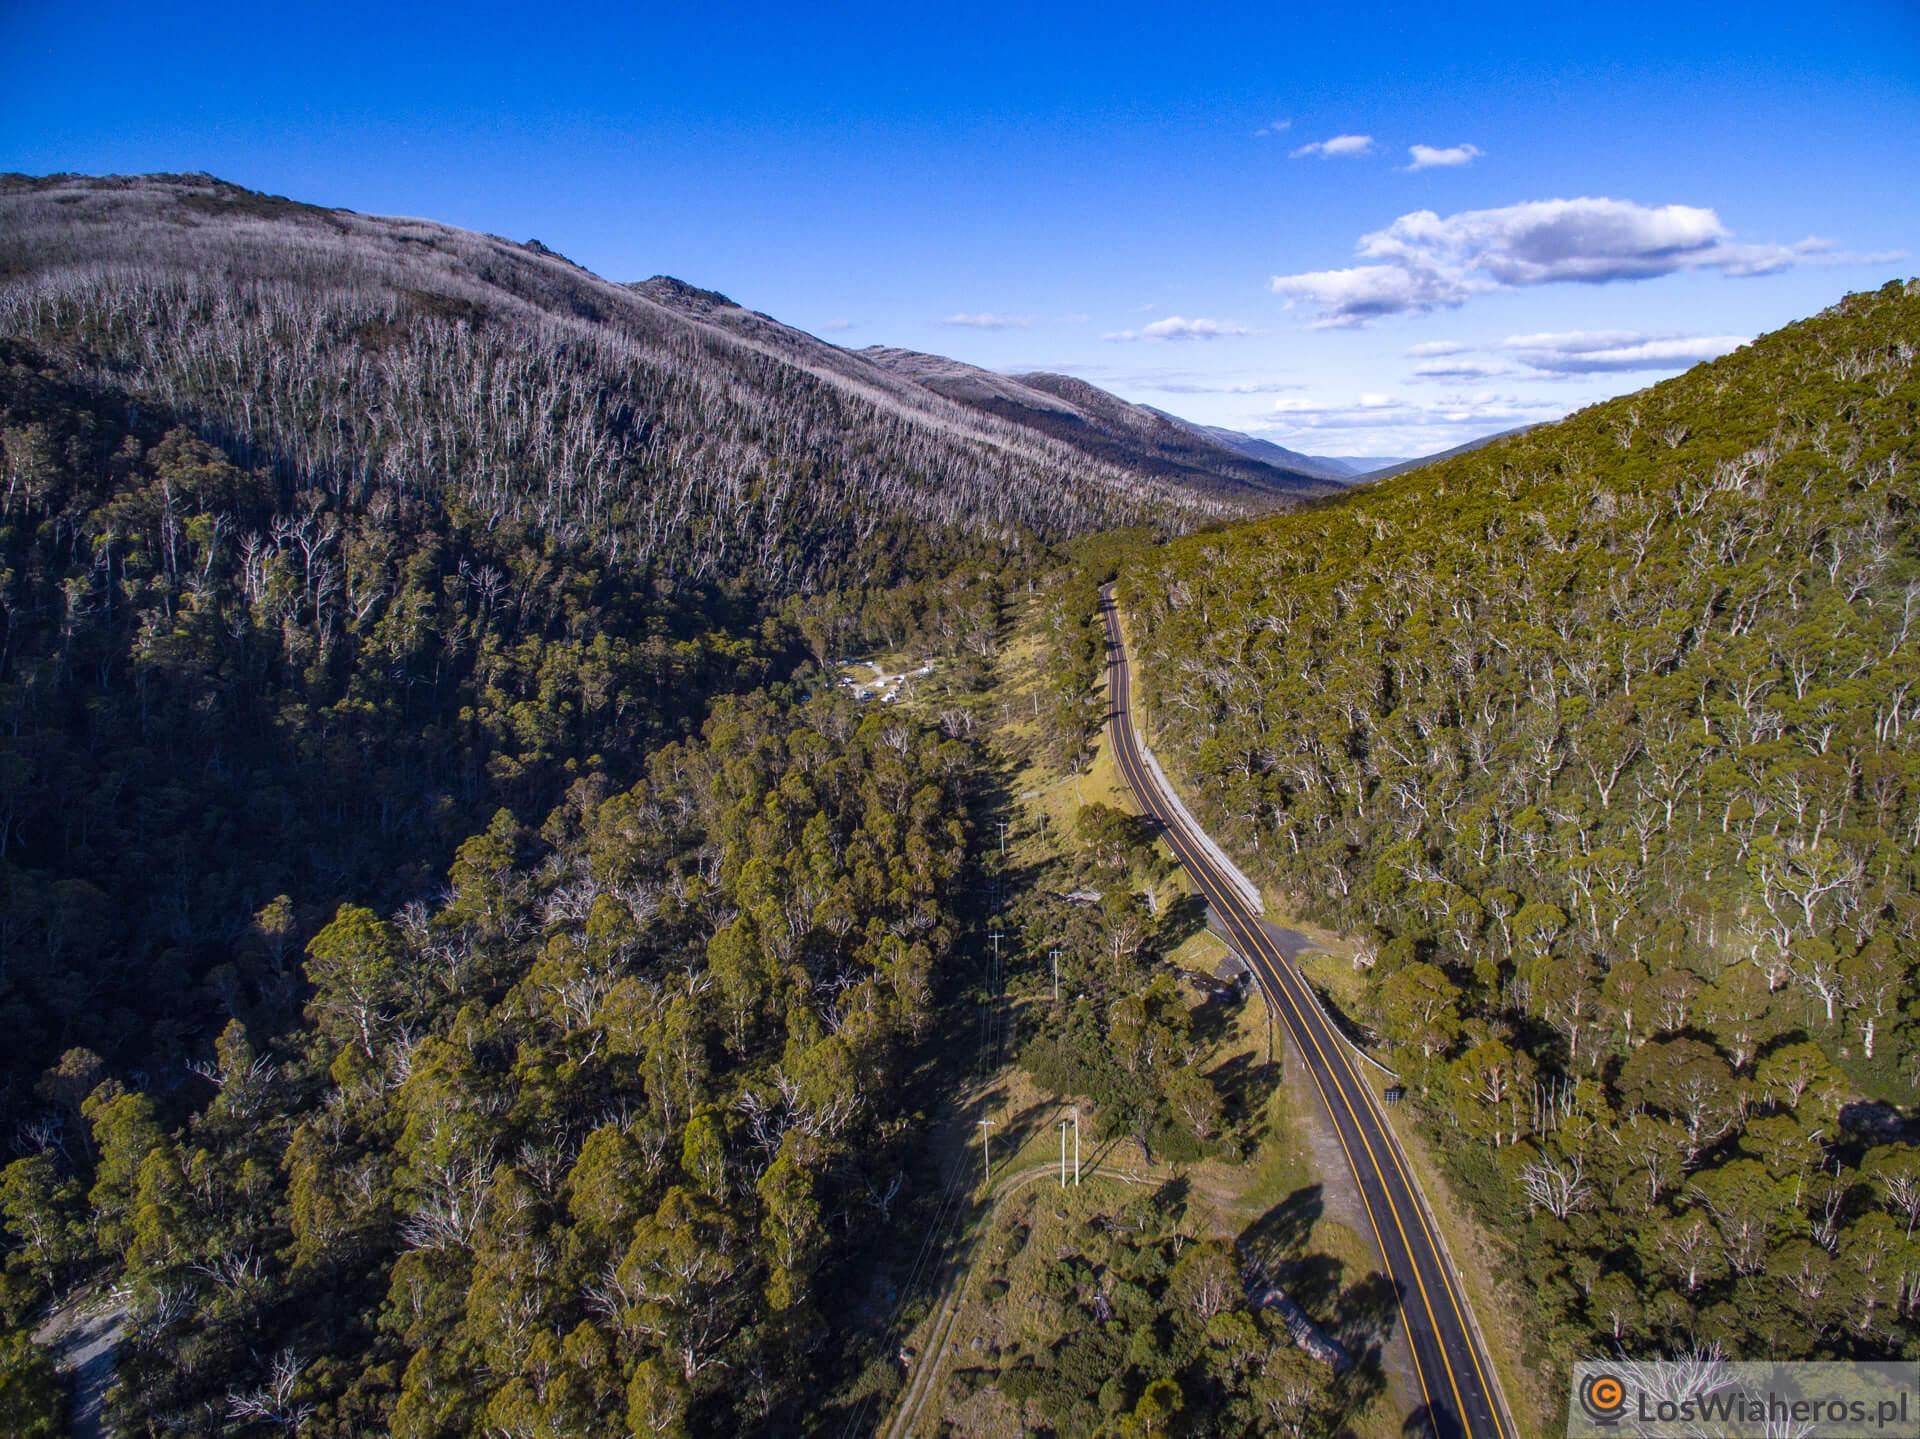 The Alpine Way, Kosciuszko National Park, Australia